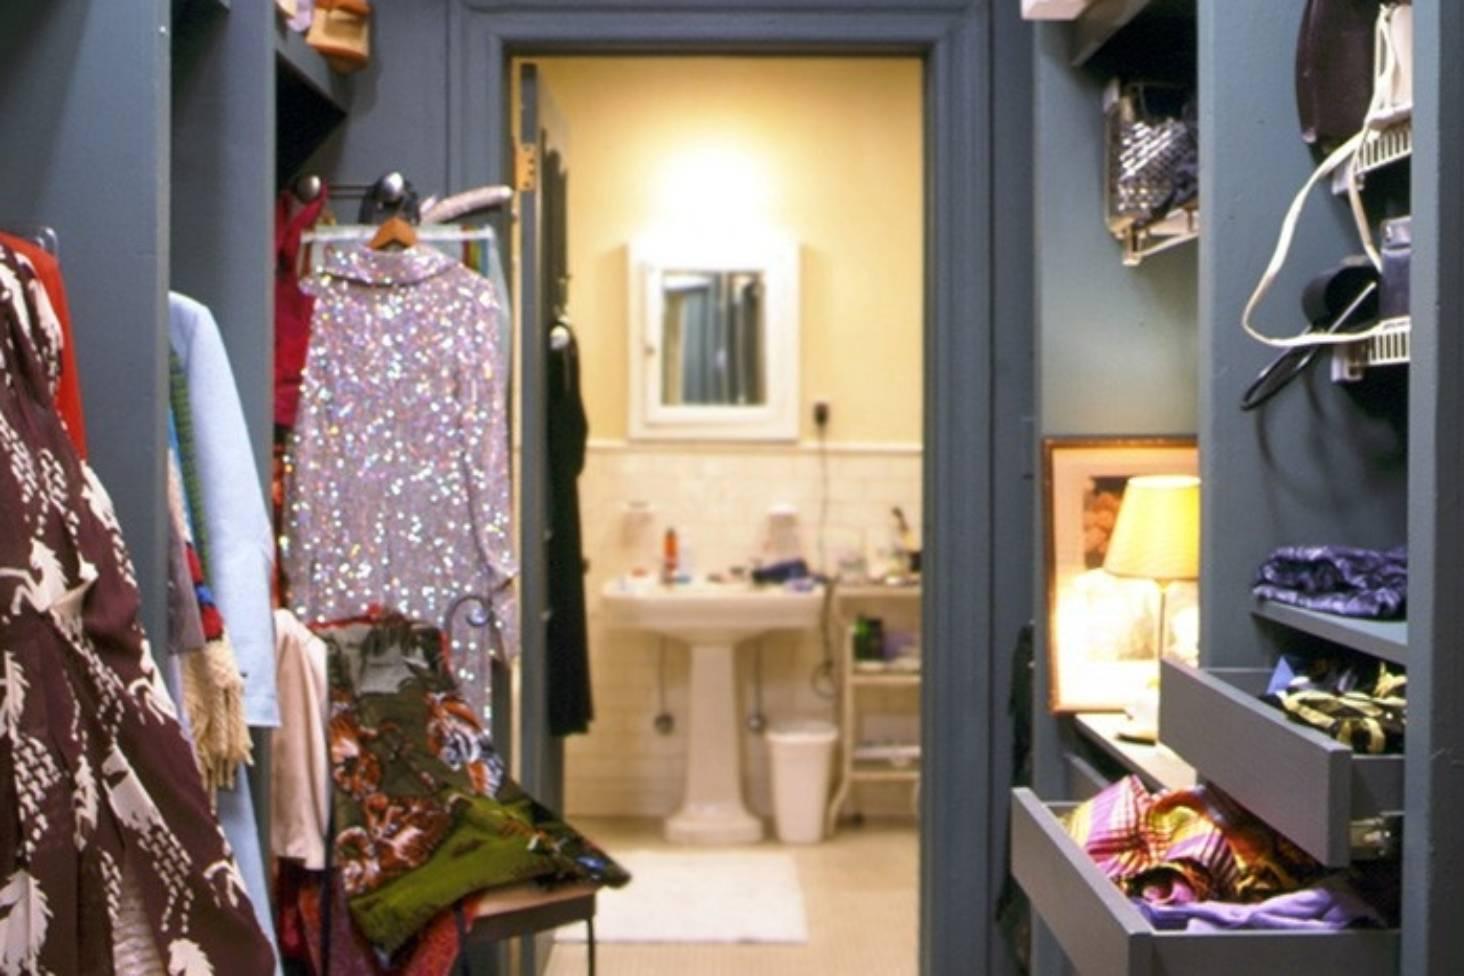 Ensuite Through The Wardrobe Is It A Good Idea Stuff Co Nz